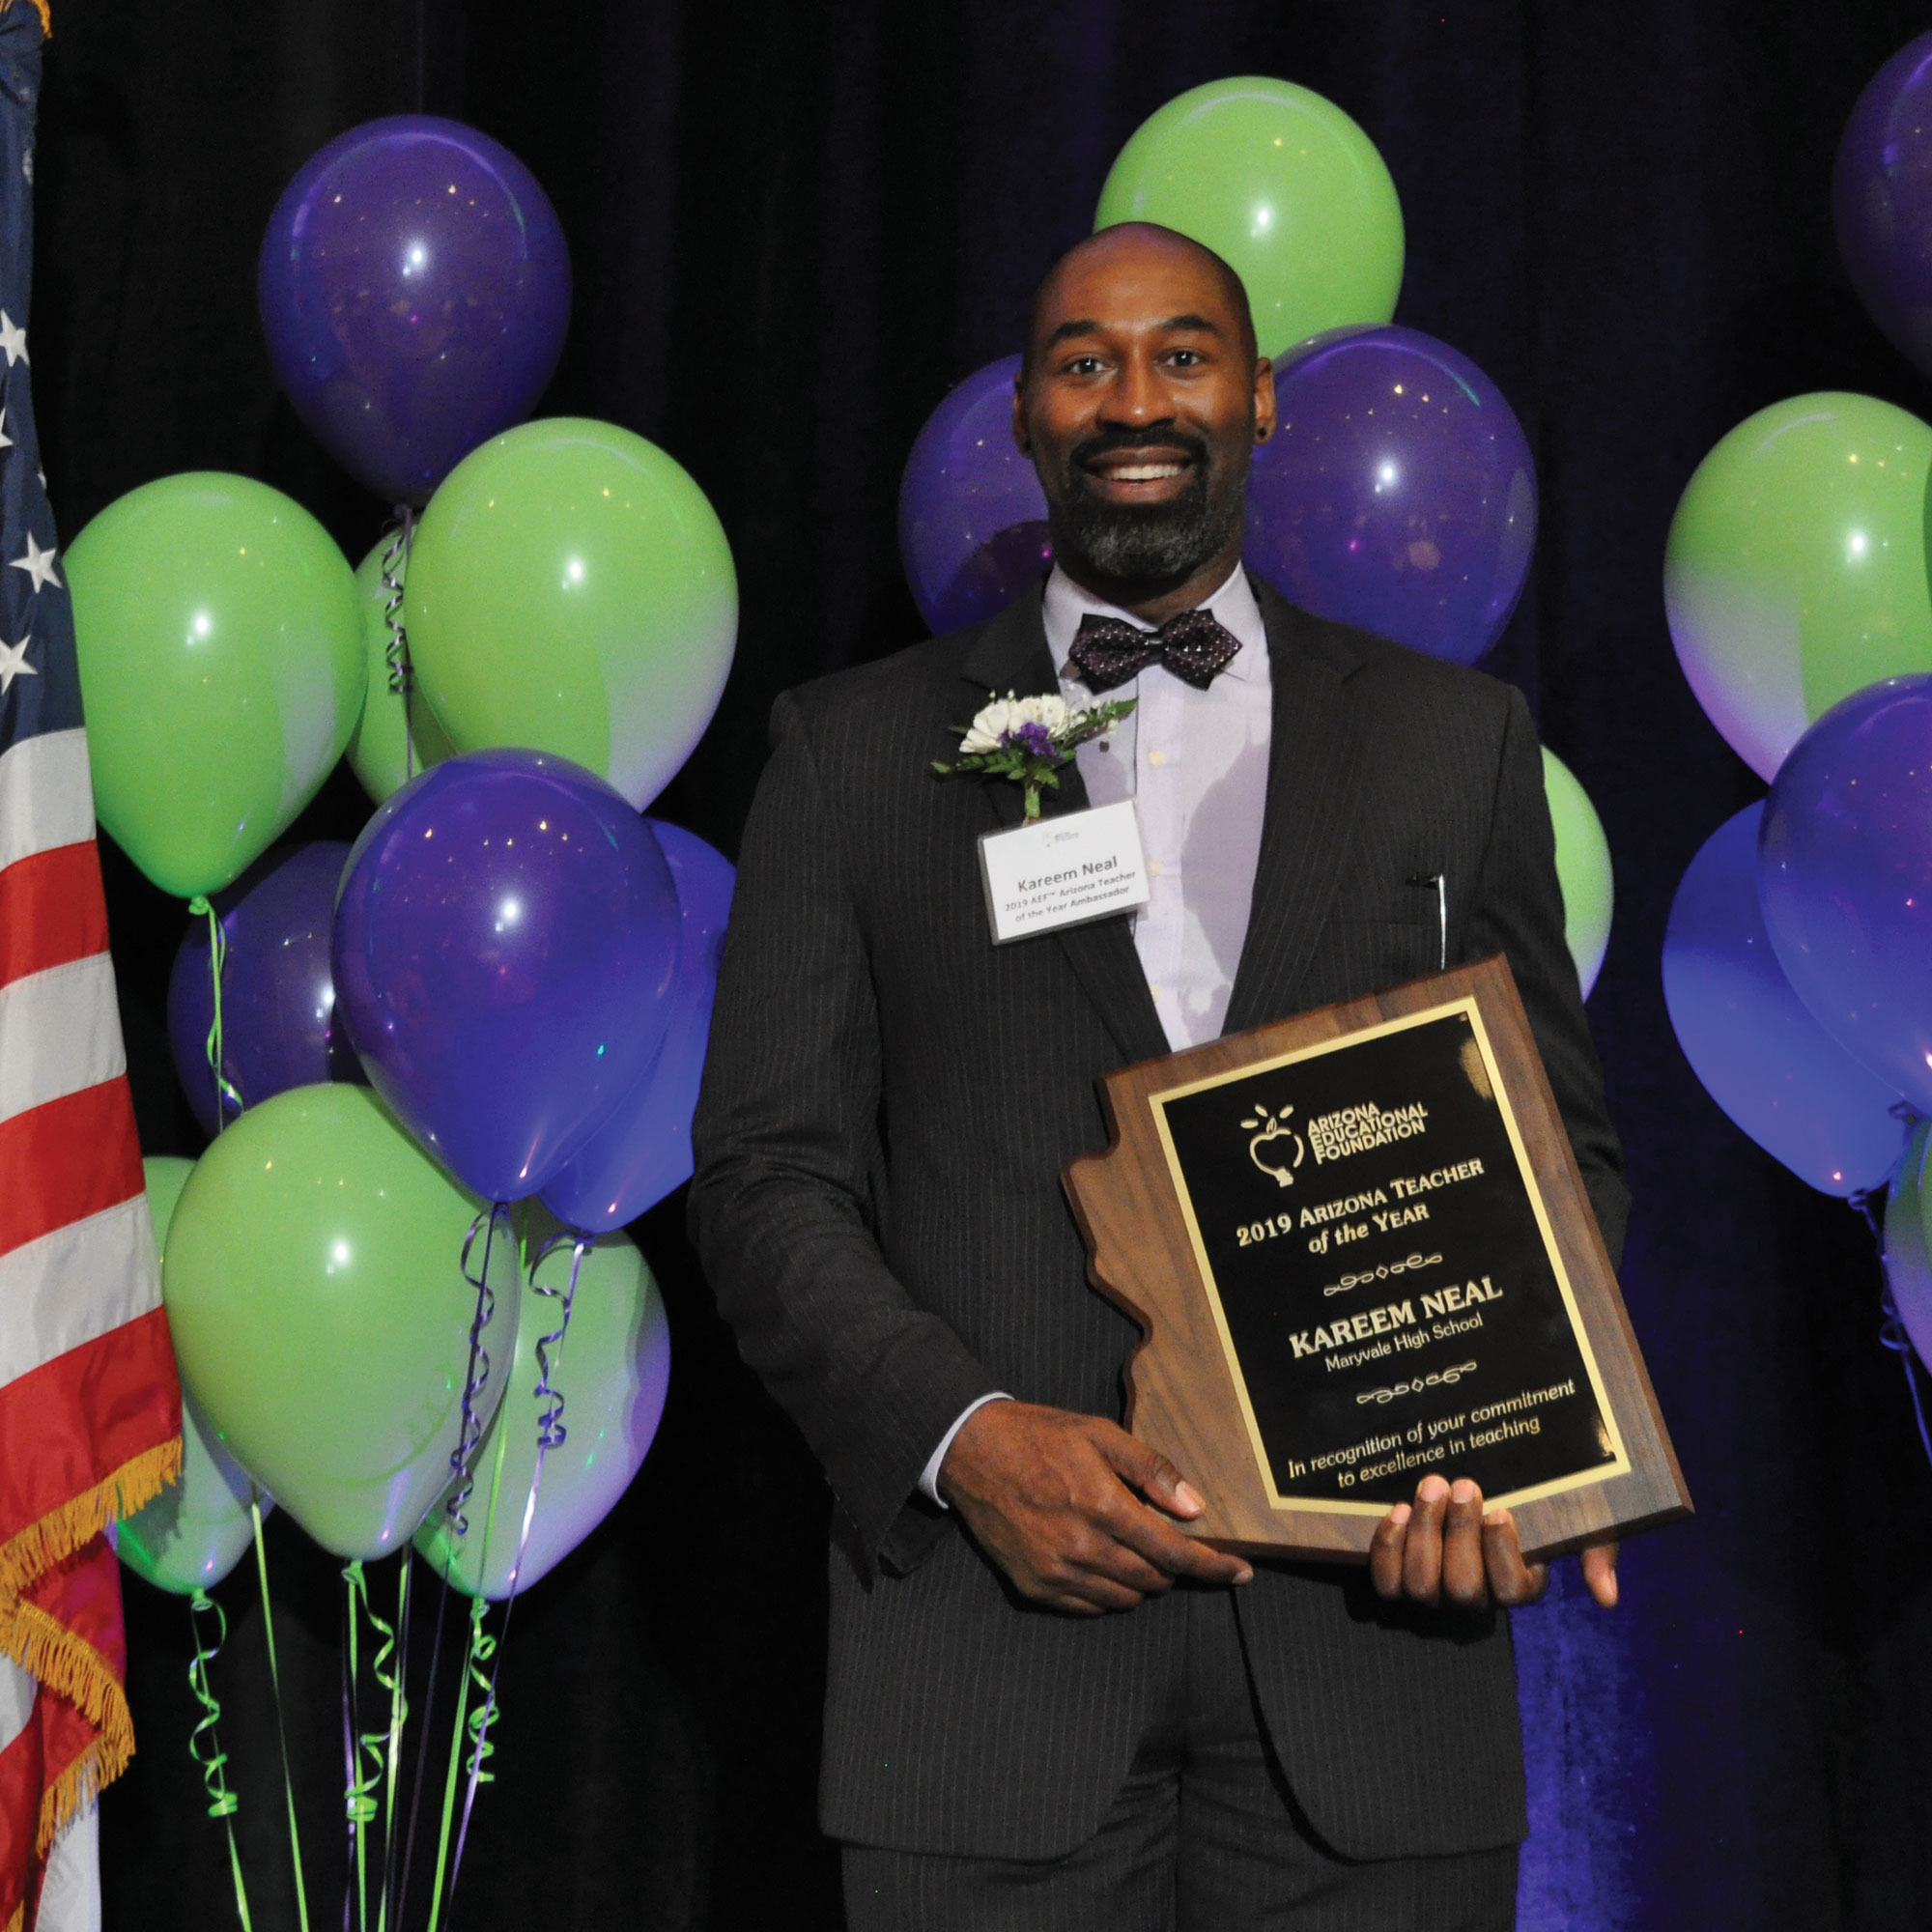 Photo courtesy AZ Education News